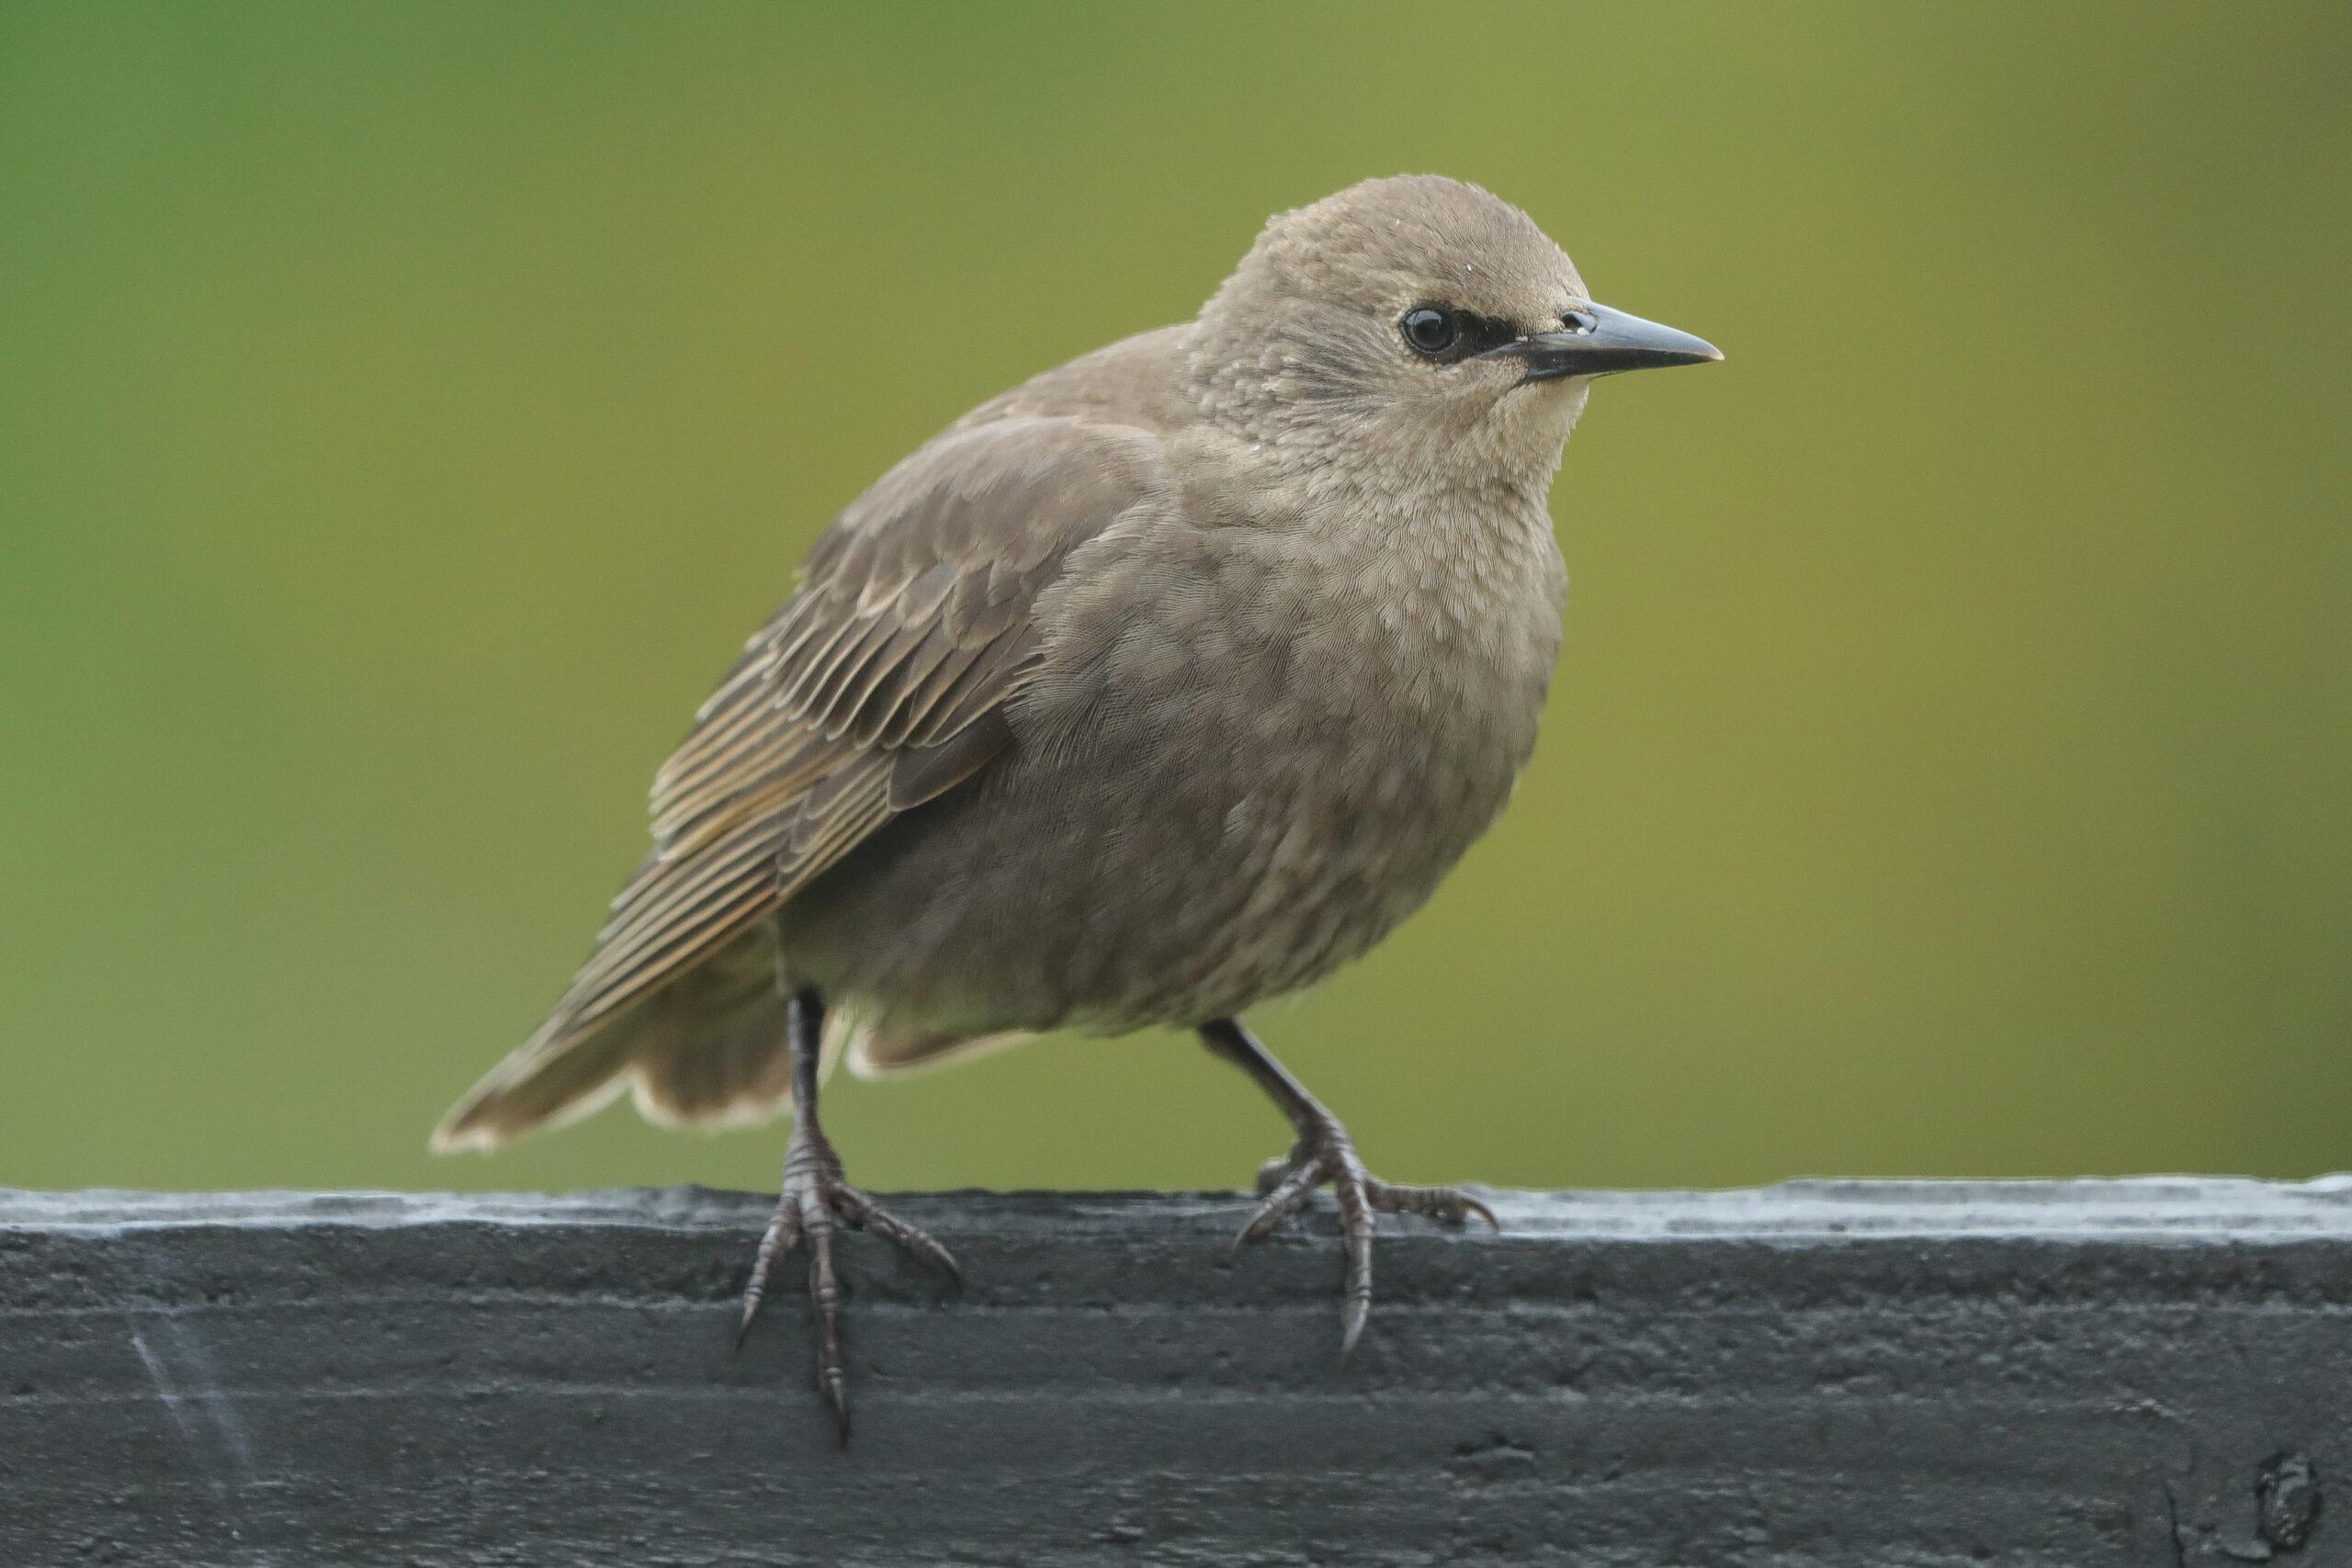 What fledgling am I seeing in my garden?